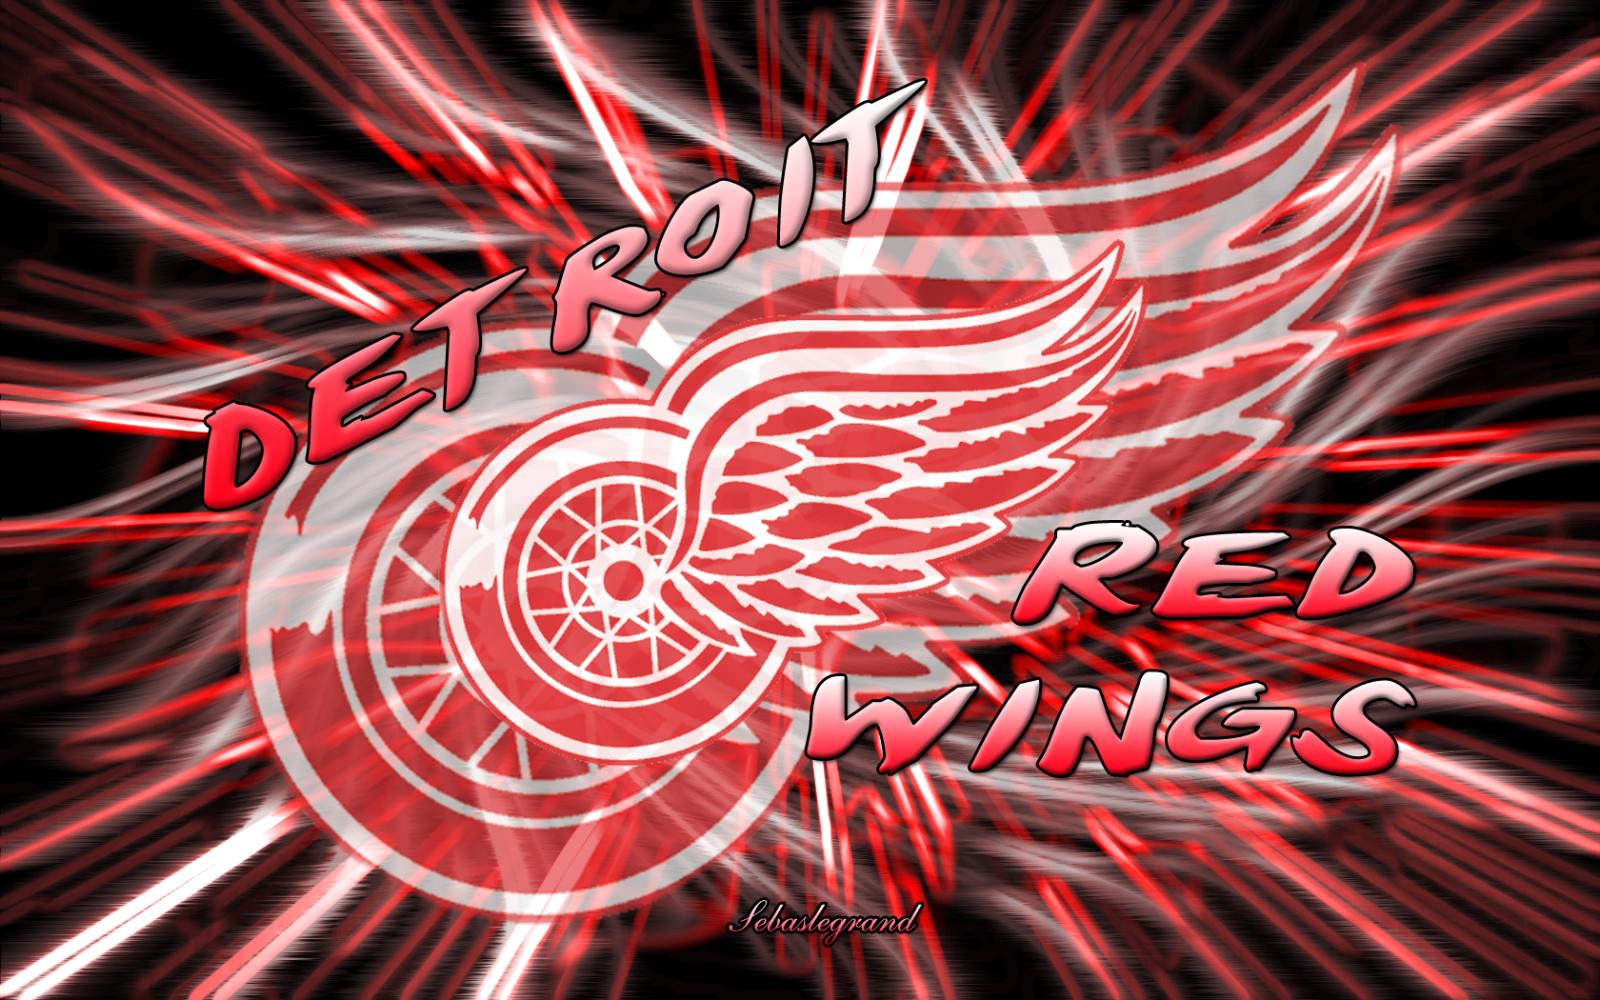 Fondos de Detroit Red Wings Fondos de pantalla de Detroit Red Wings 1600x1000